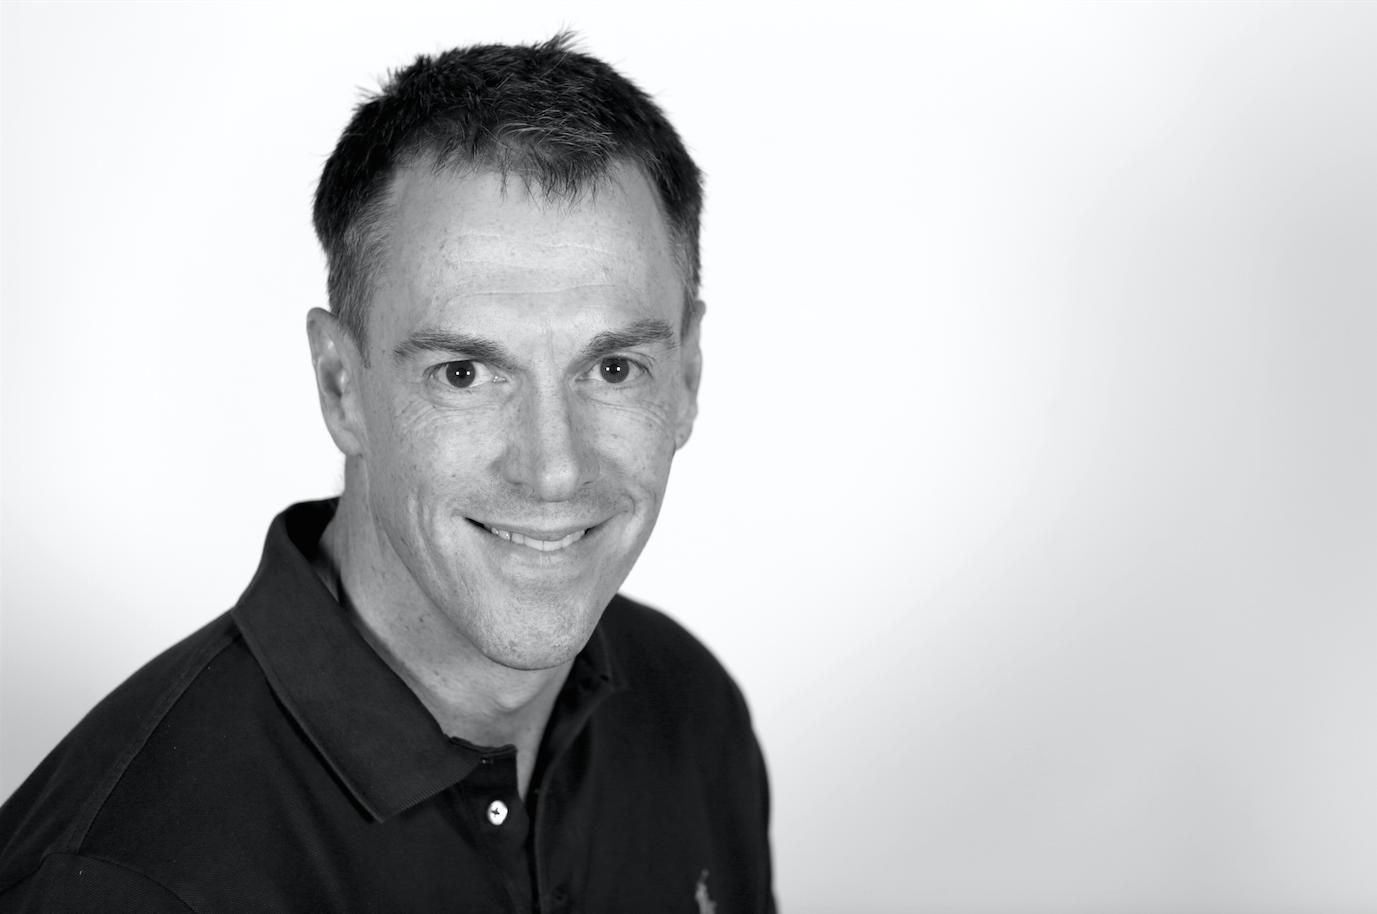 Mark Evans Presidente Ejecutivo (CEO) de Telefónica Reino Unido